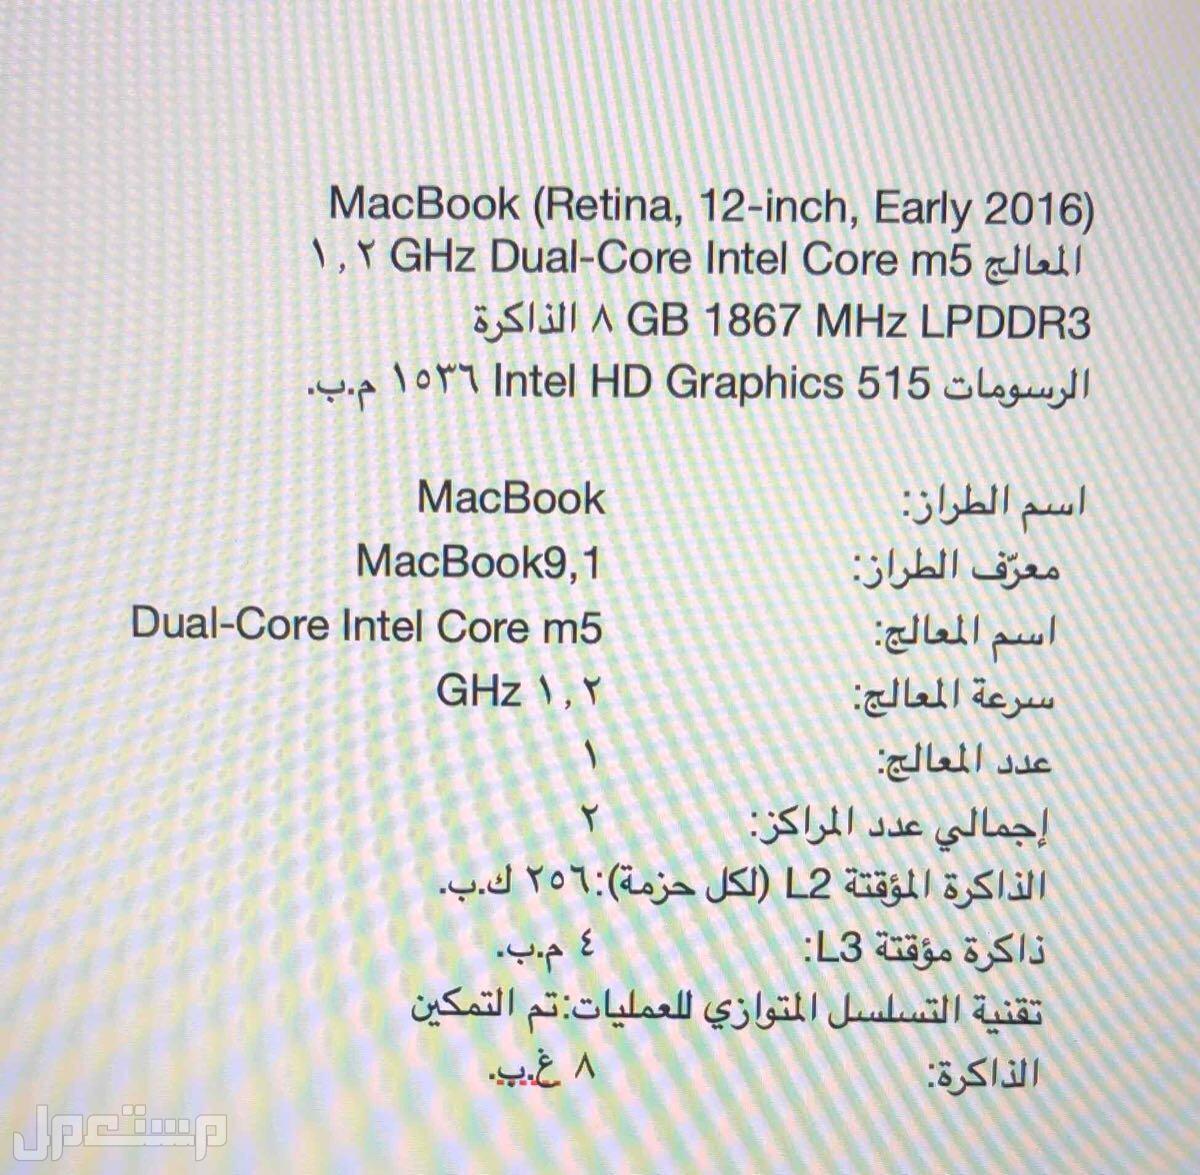 macbook رتينا 12 انش 2016 اللون وردي مستعمل بدون كرتون